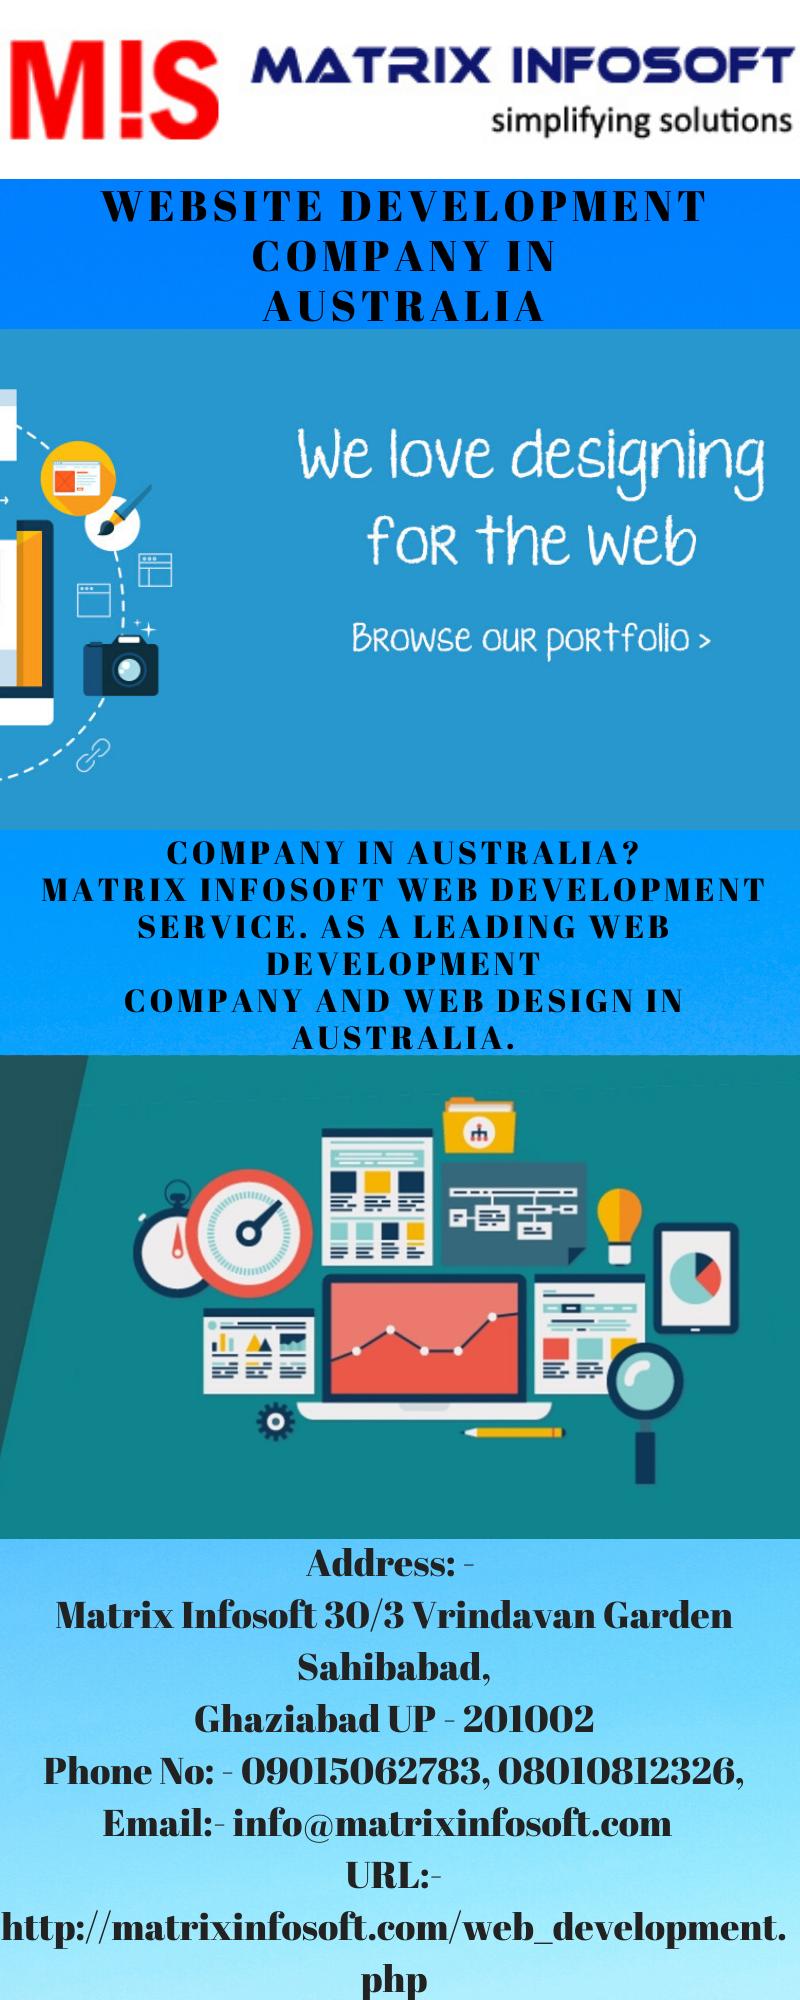 Website Development Company In Australia In 2020 Website Development Company Website Development Web Development Company